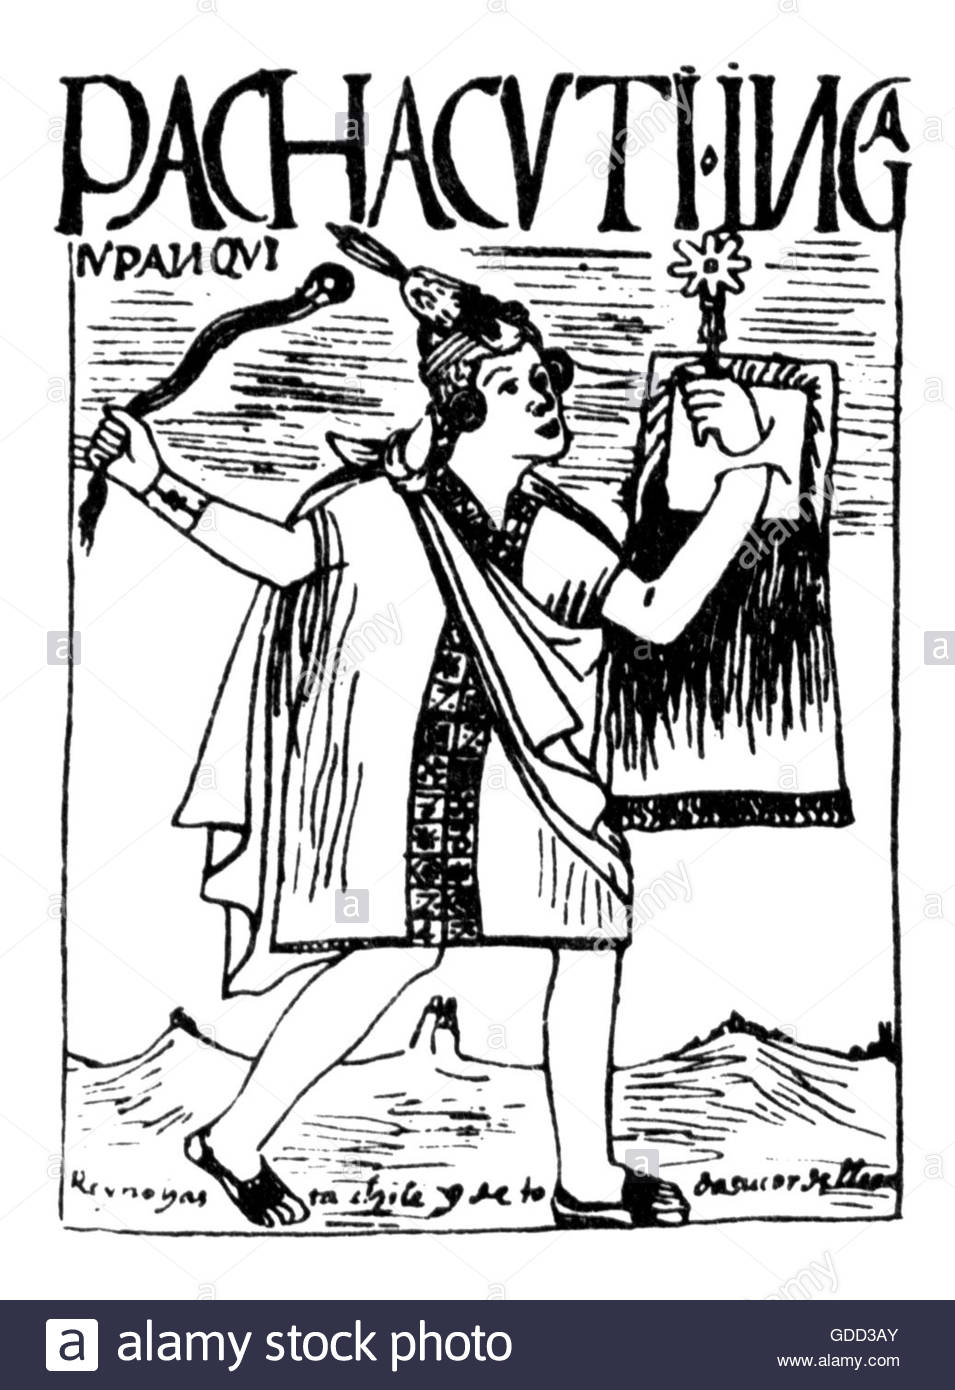 Pachacutec Yupanqui, + 1471, 9th ruler of the Inca 1438 - 1471, full length, pen drawing, 'El primer nueva coronica - Stock Image